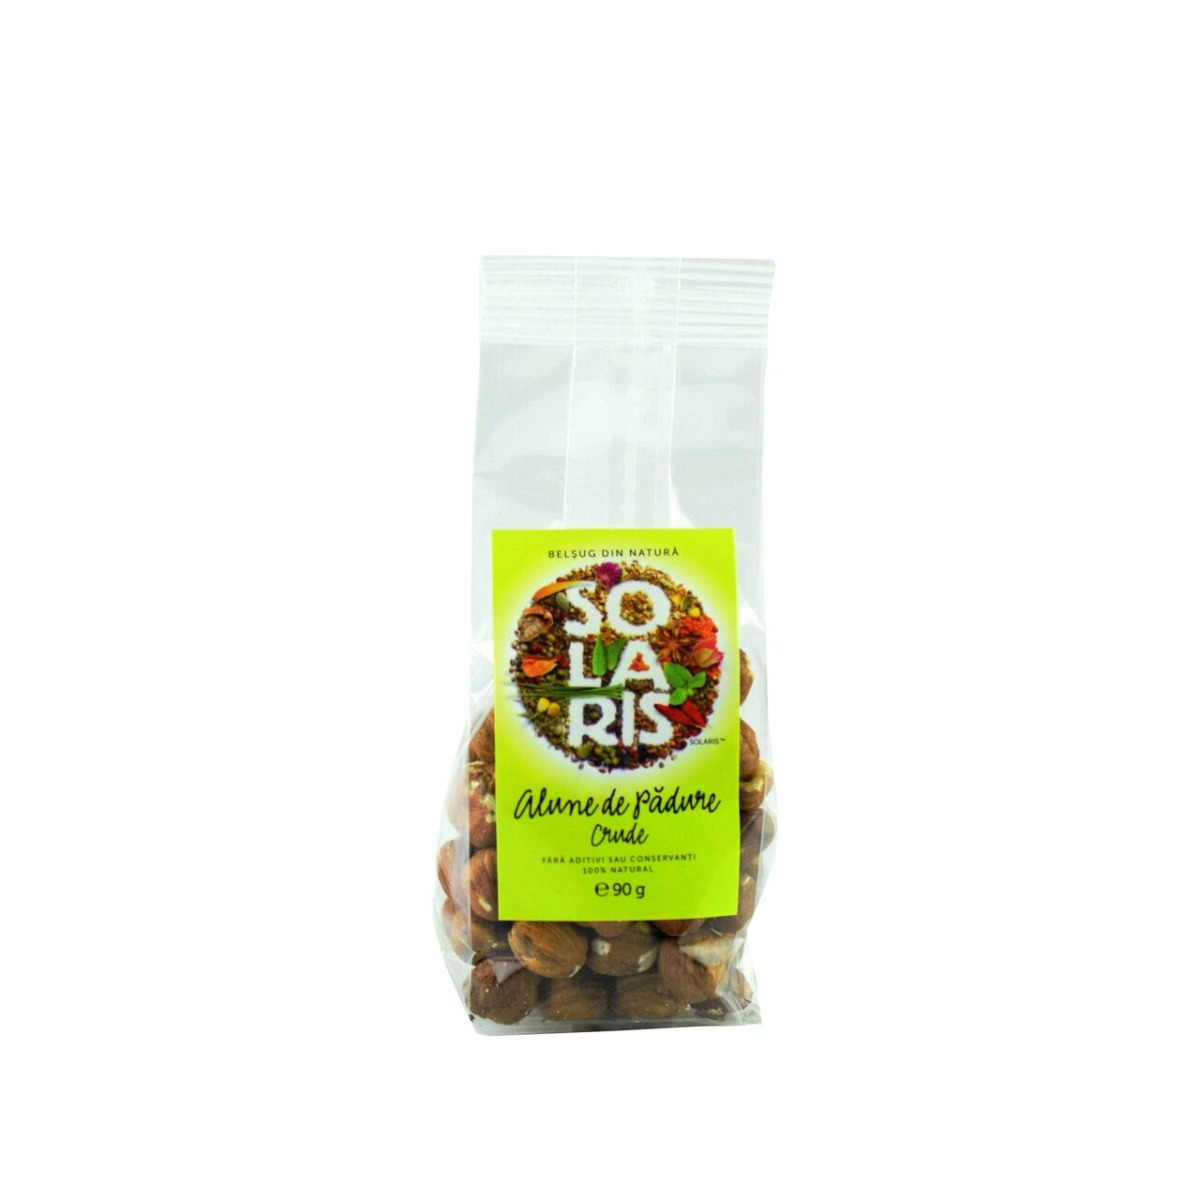 Fructe crude - alune de padure, 90g, Solaris drmax.ro